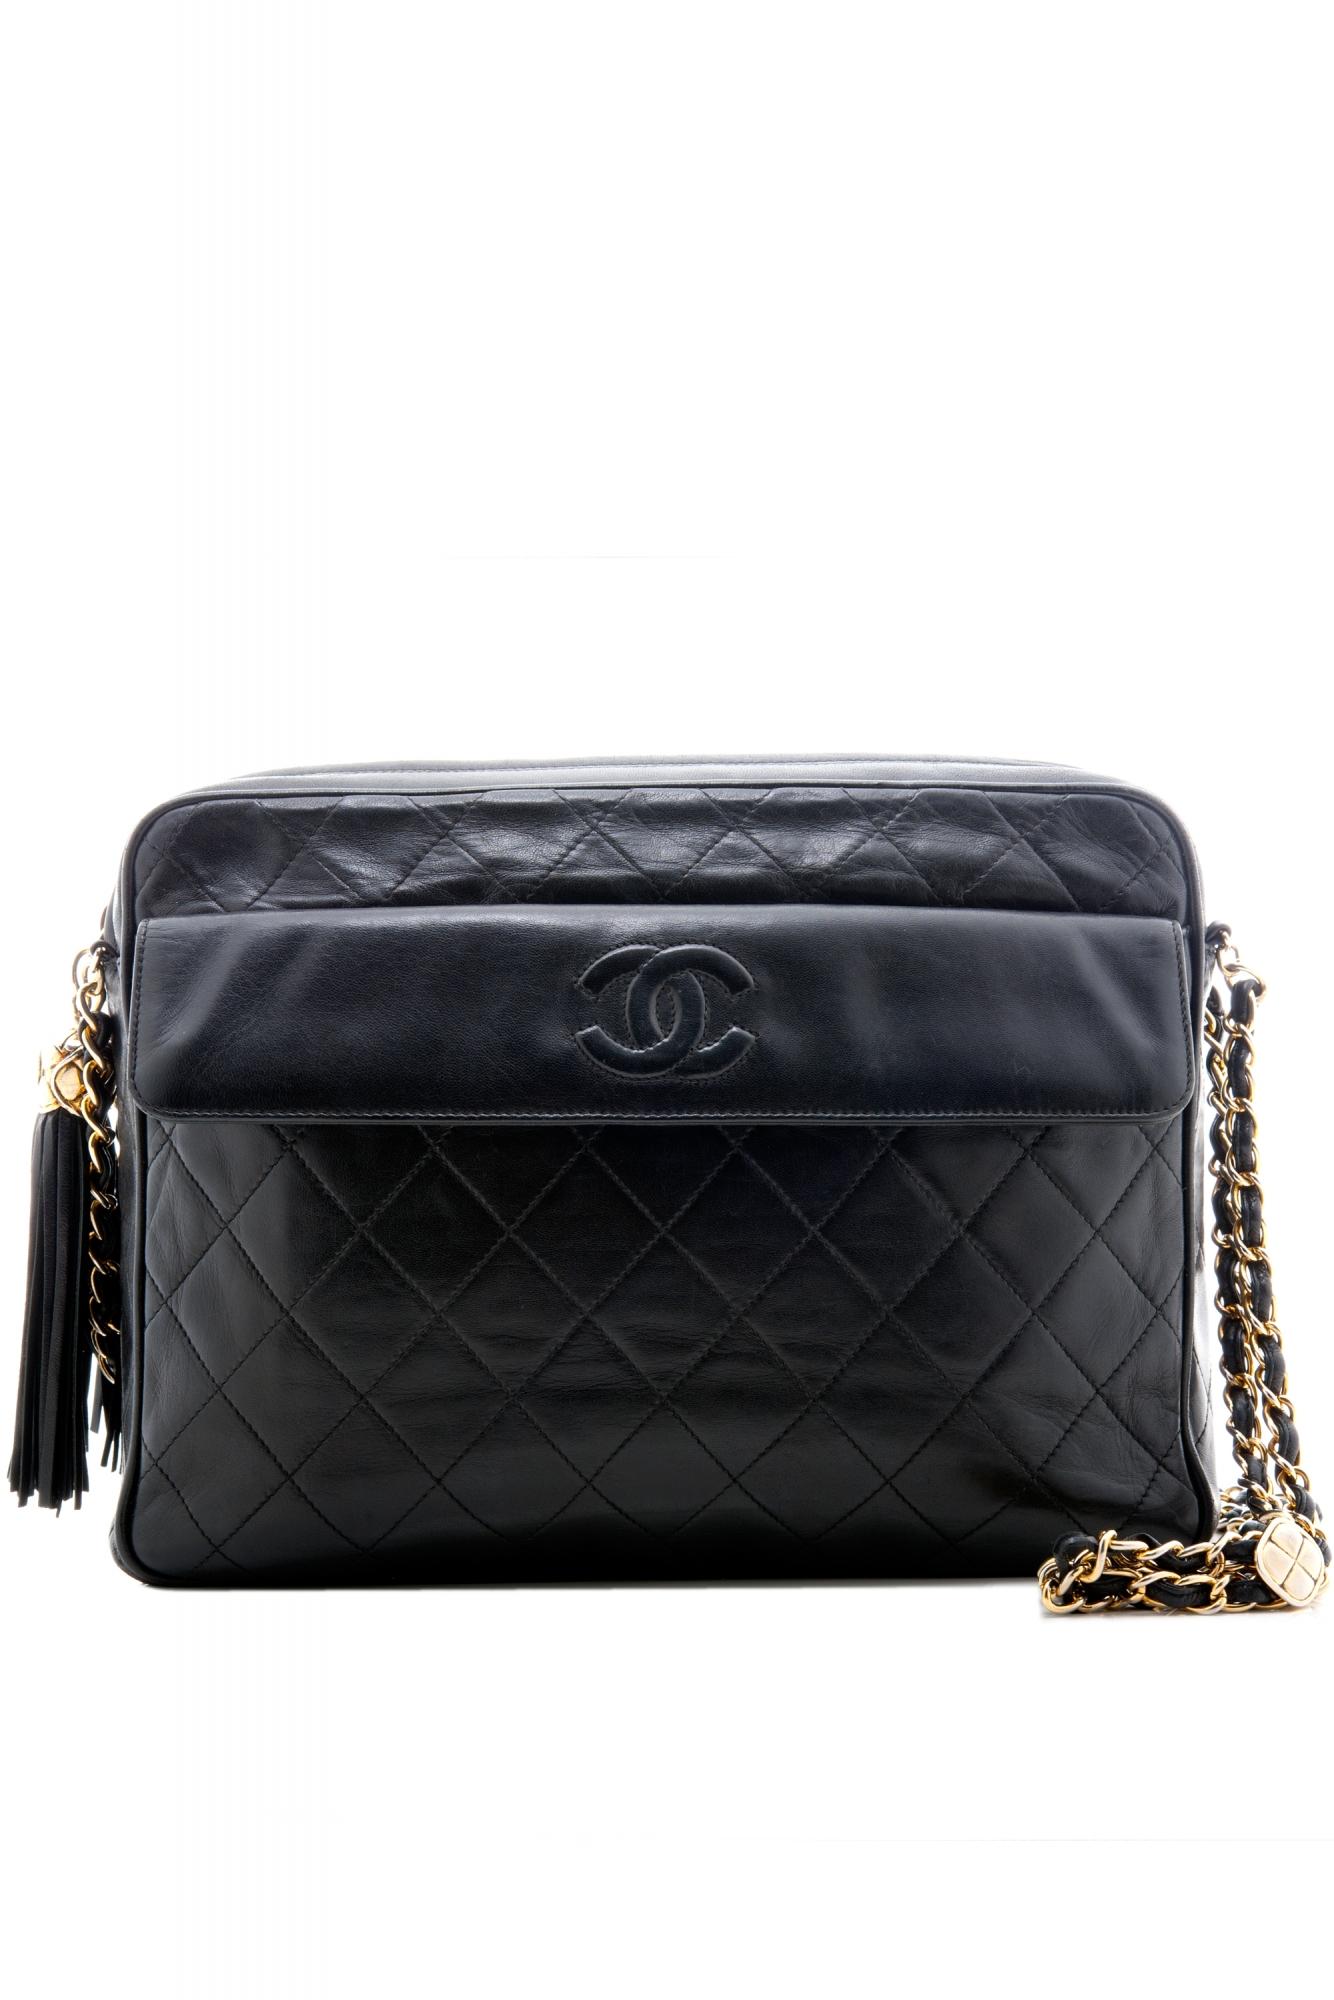 8b54cbd1 Chanel Vintage Black Quilted Camera Tassel Bag | La Doyenne